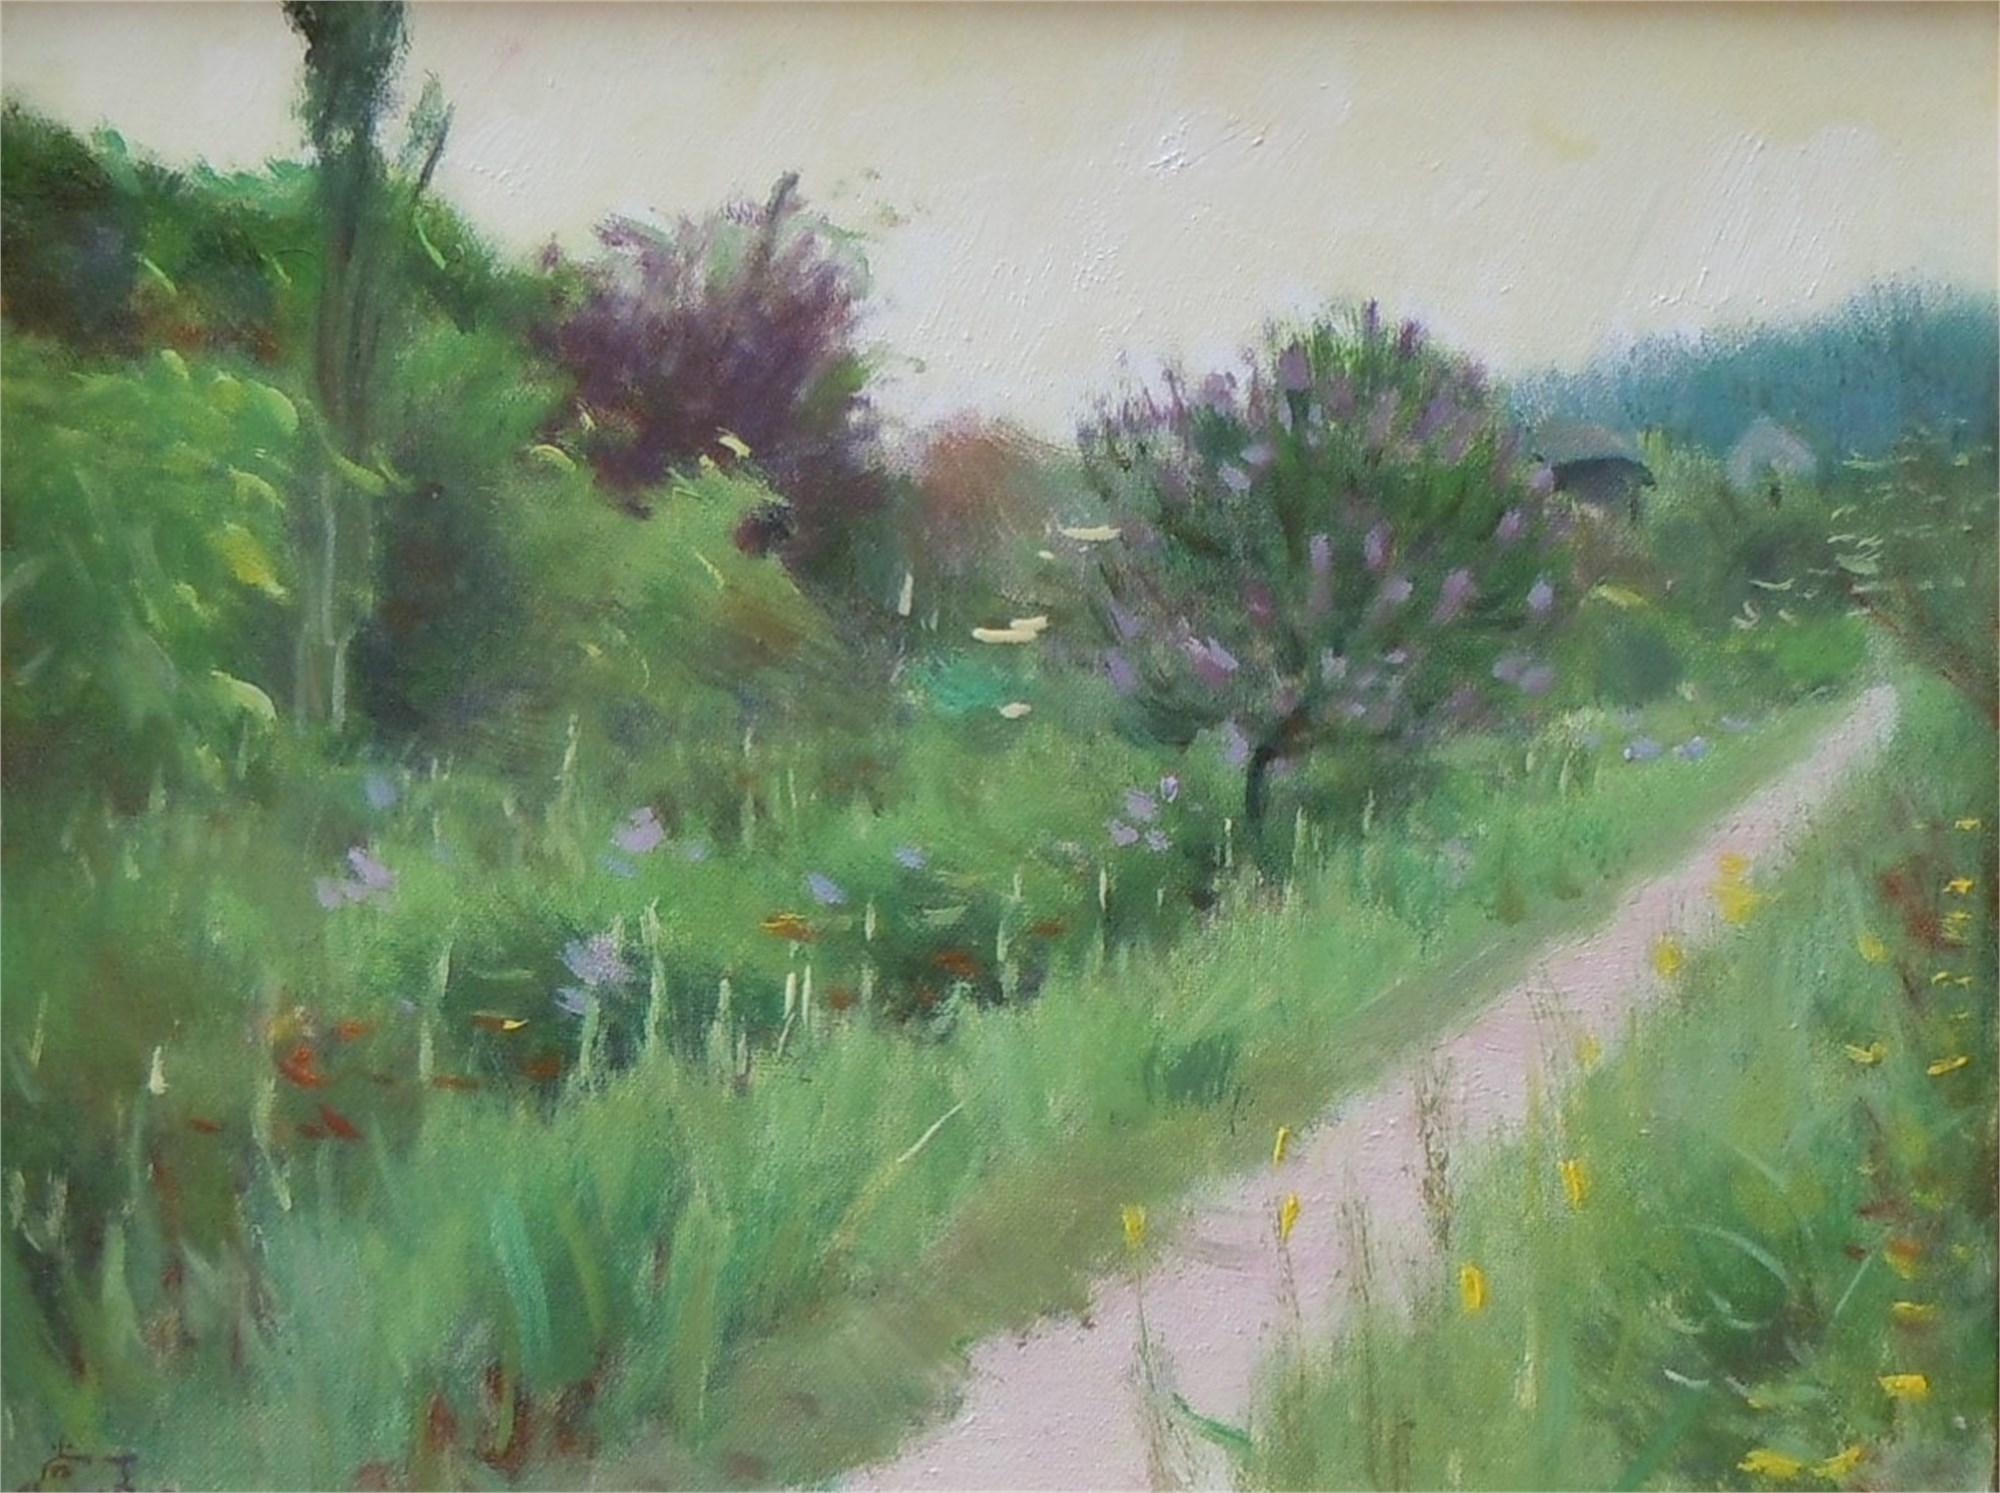 Monet's Garden 4 by Shang Ding